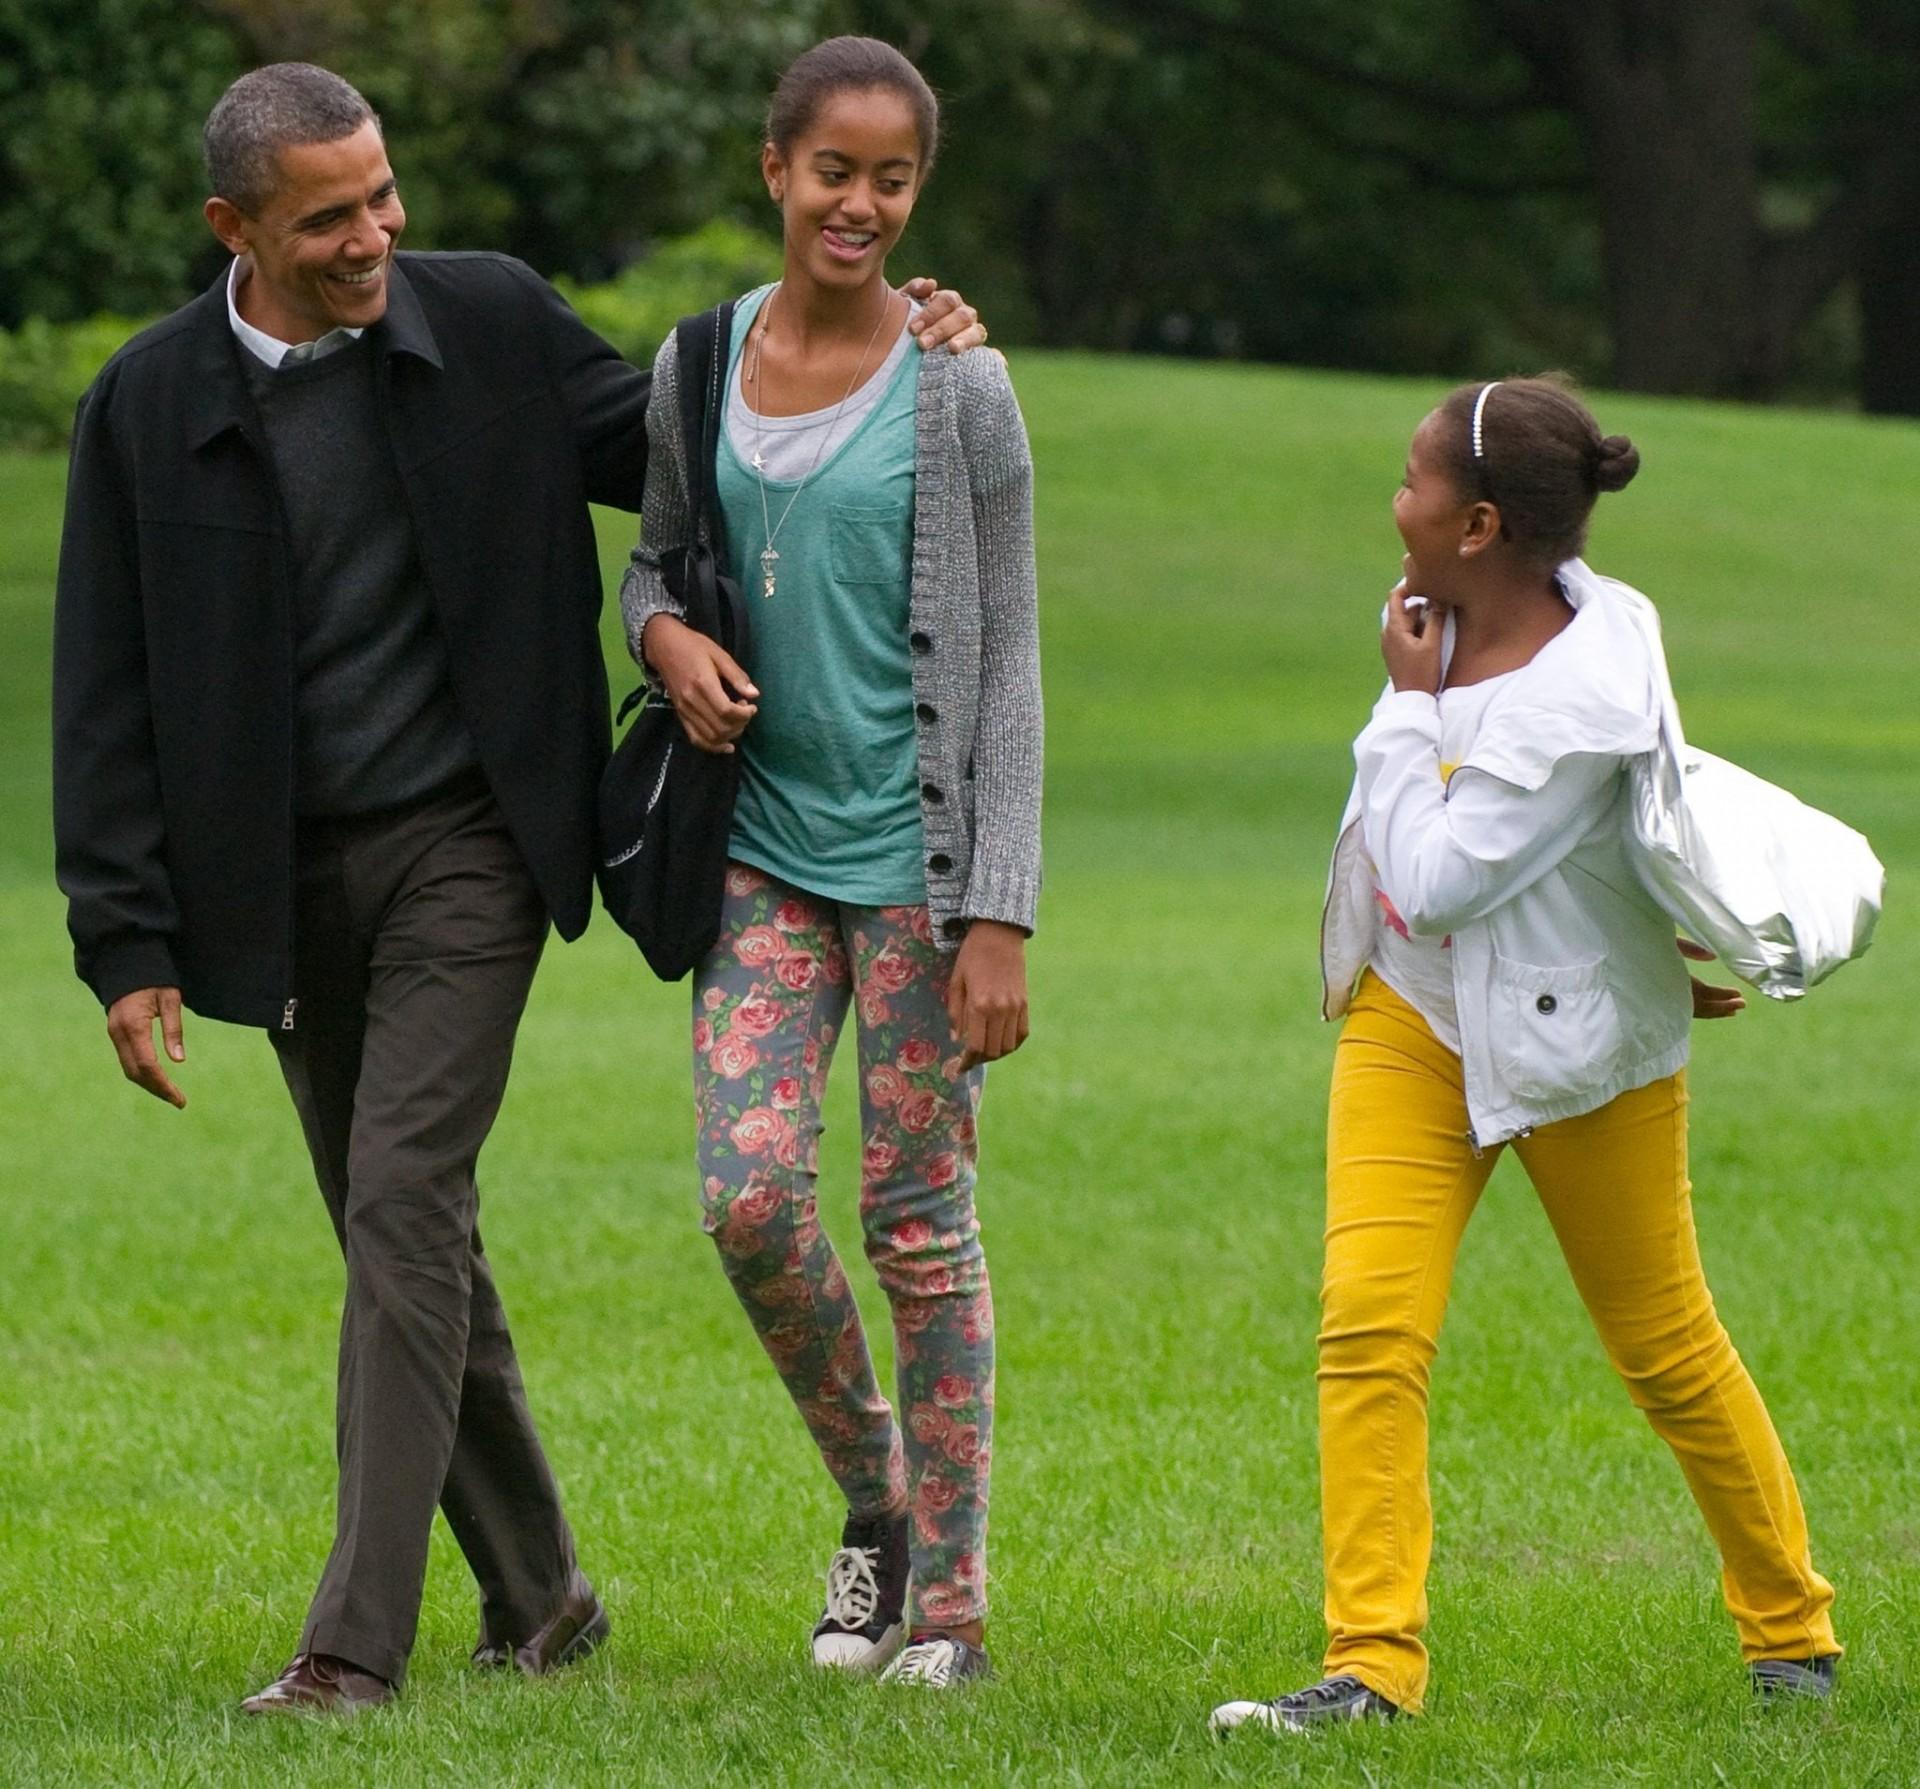 013 33bf4b263c538660 Barack Obama Cute Moments Sasha Malia 1 Essay Marvelous President Research Paper Pdf Michelle 1920